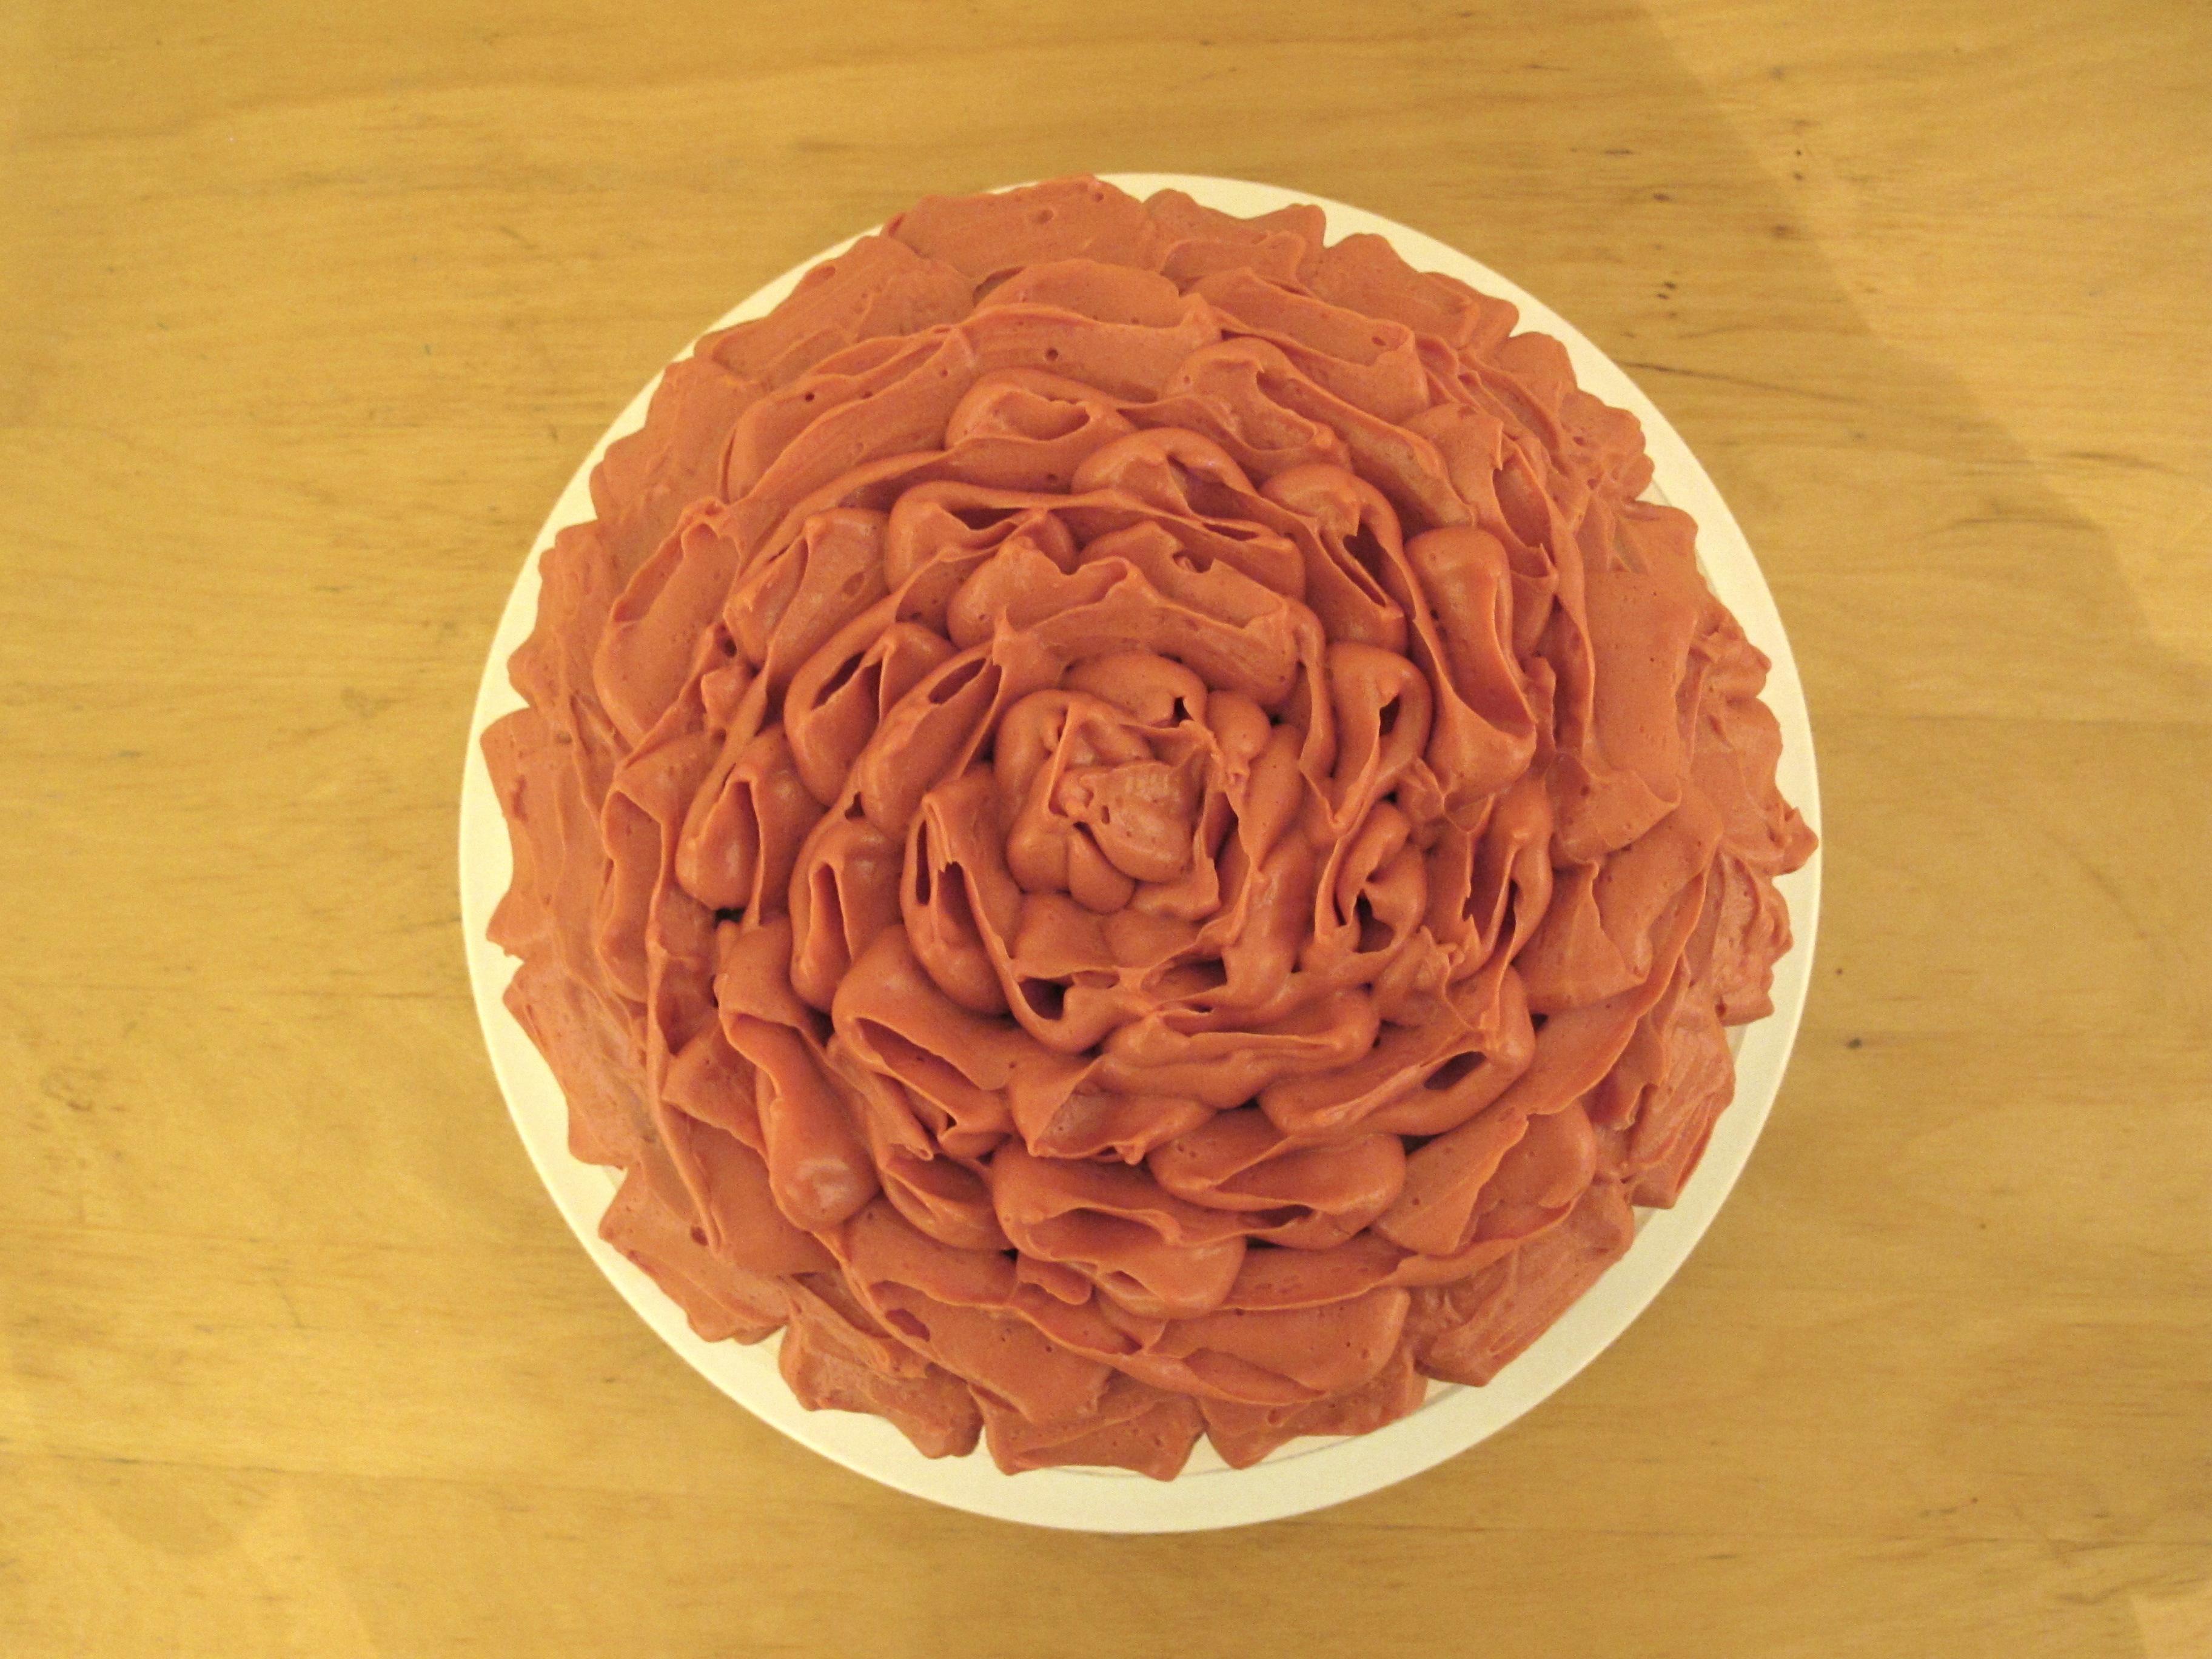 Rose Lychee Raspberry ruffled cake